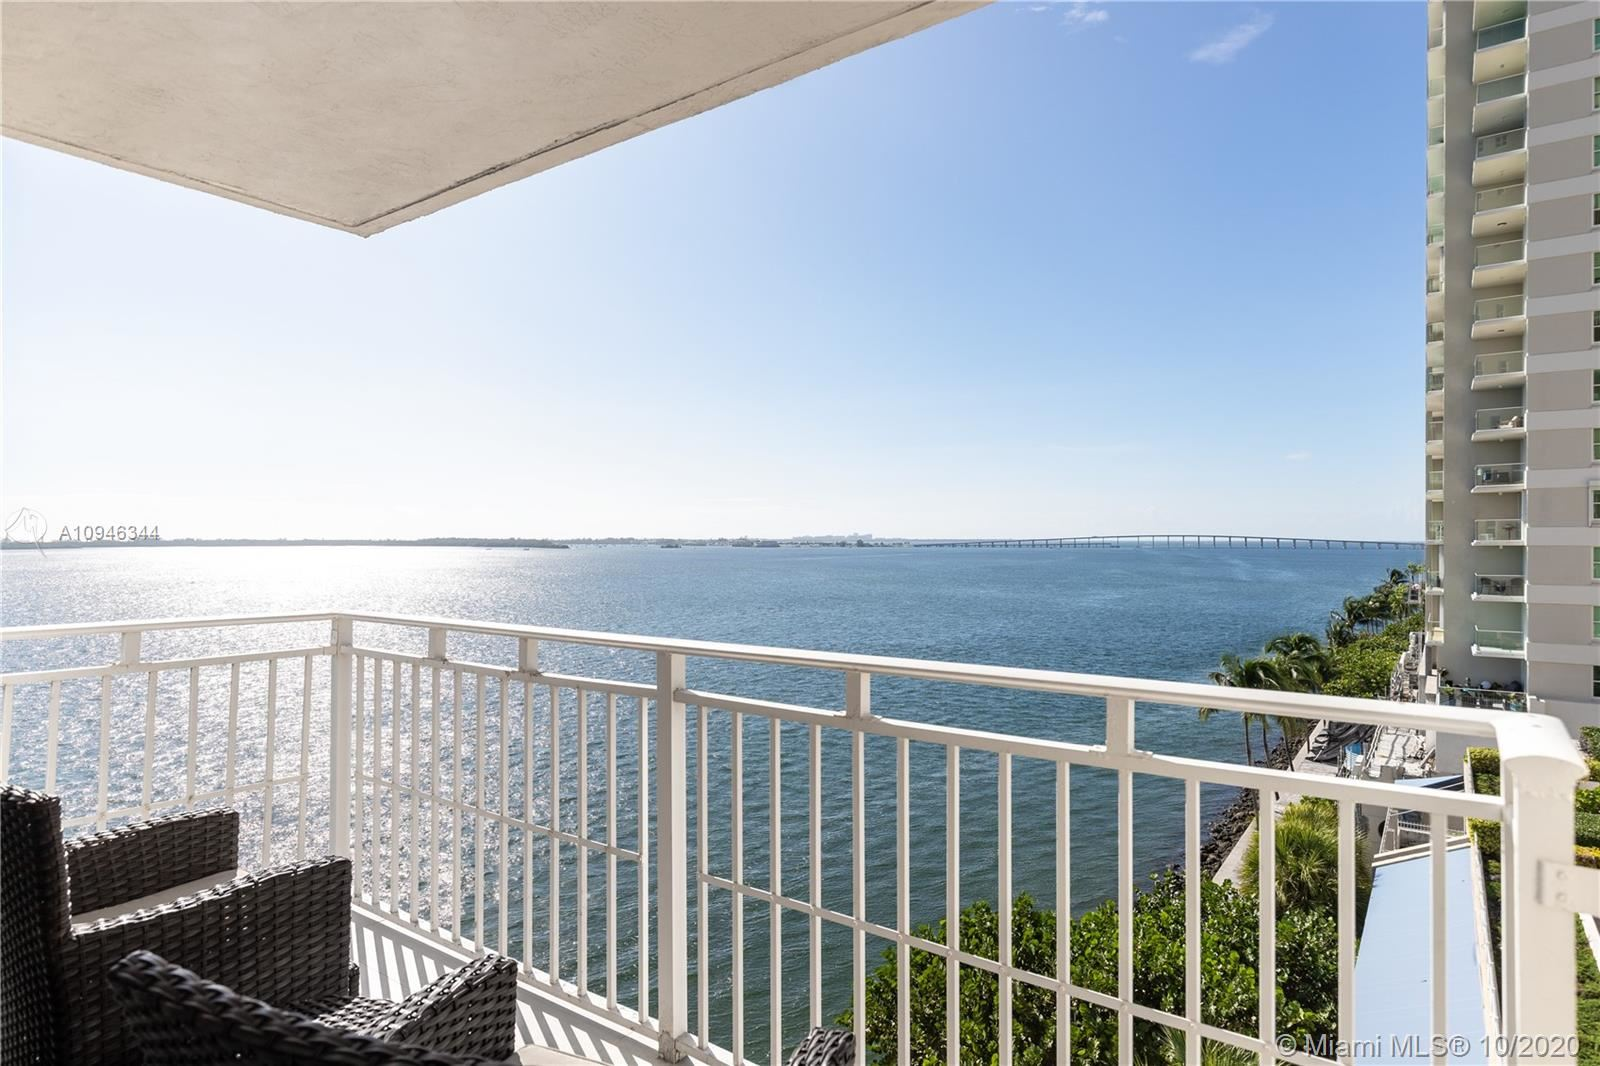 770 Claughton Island Dr #716, Miami, FL 33131 - #: A10946344